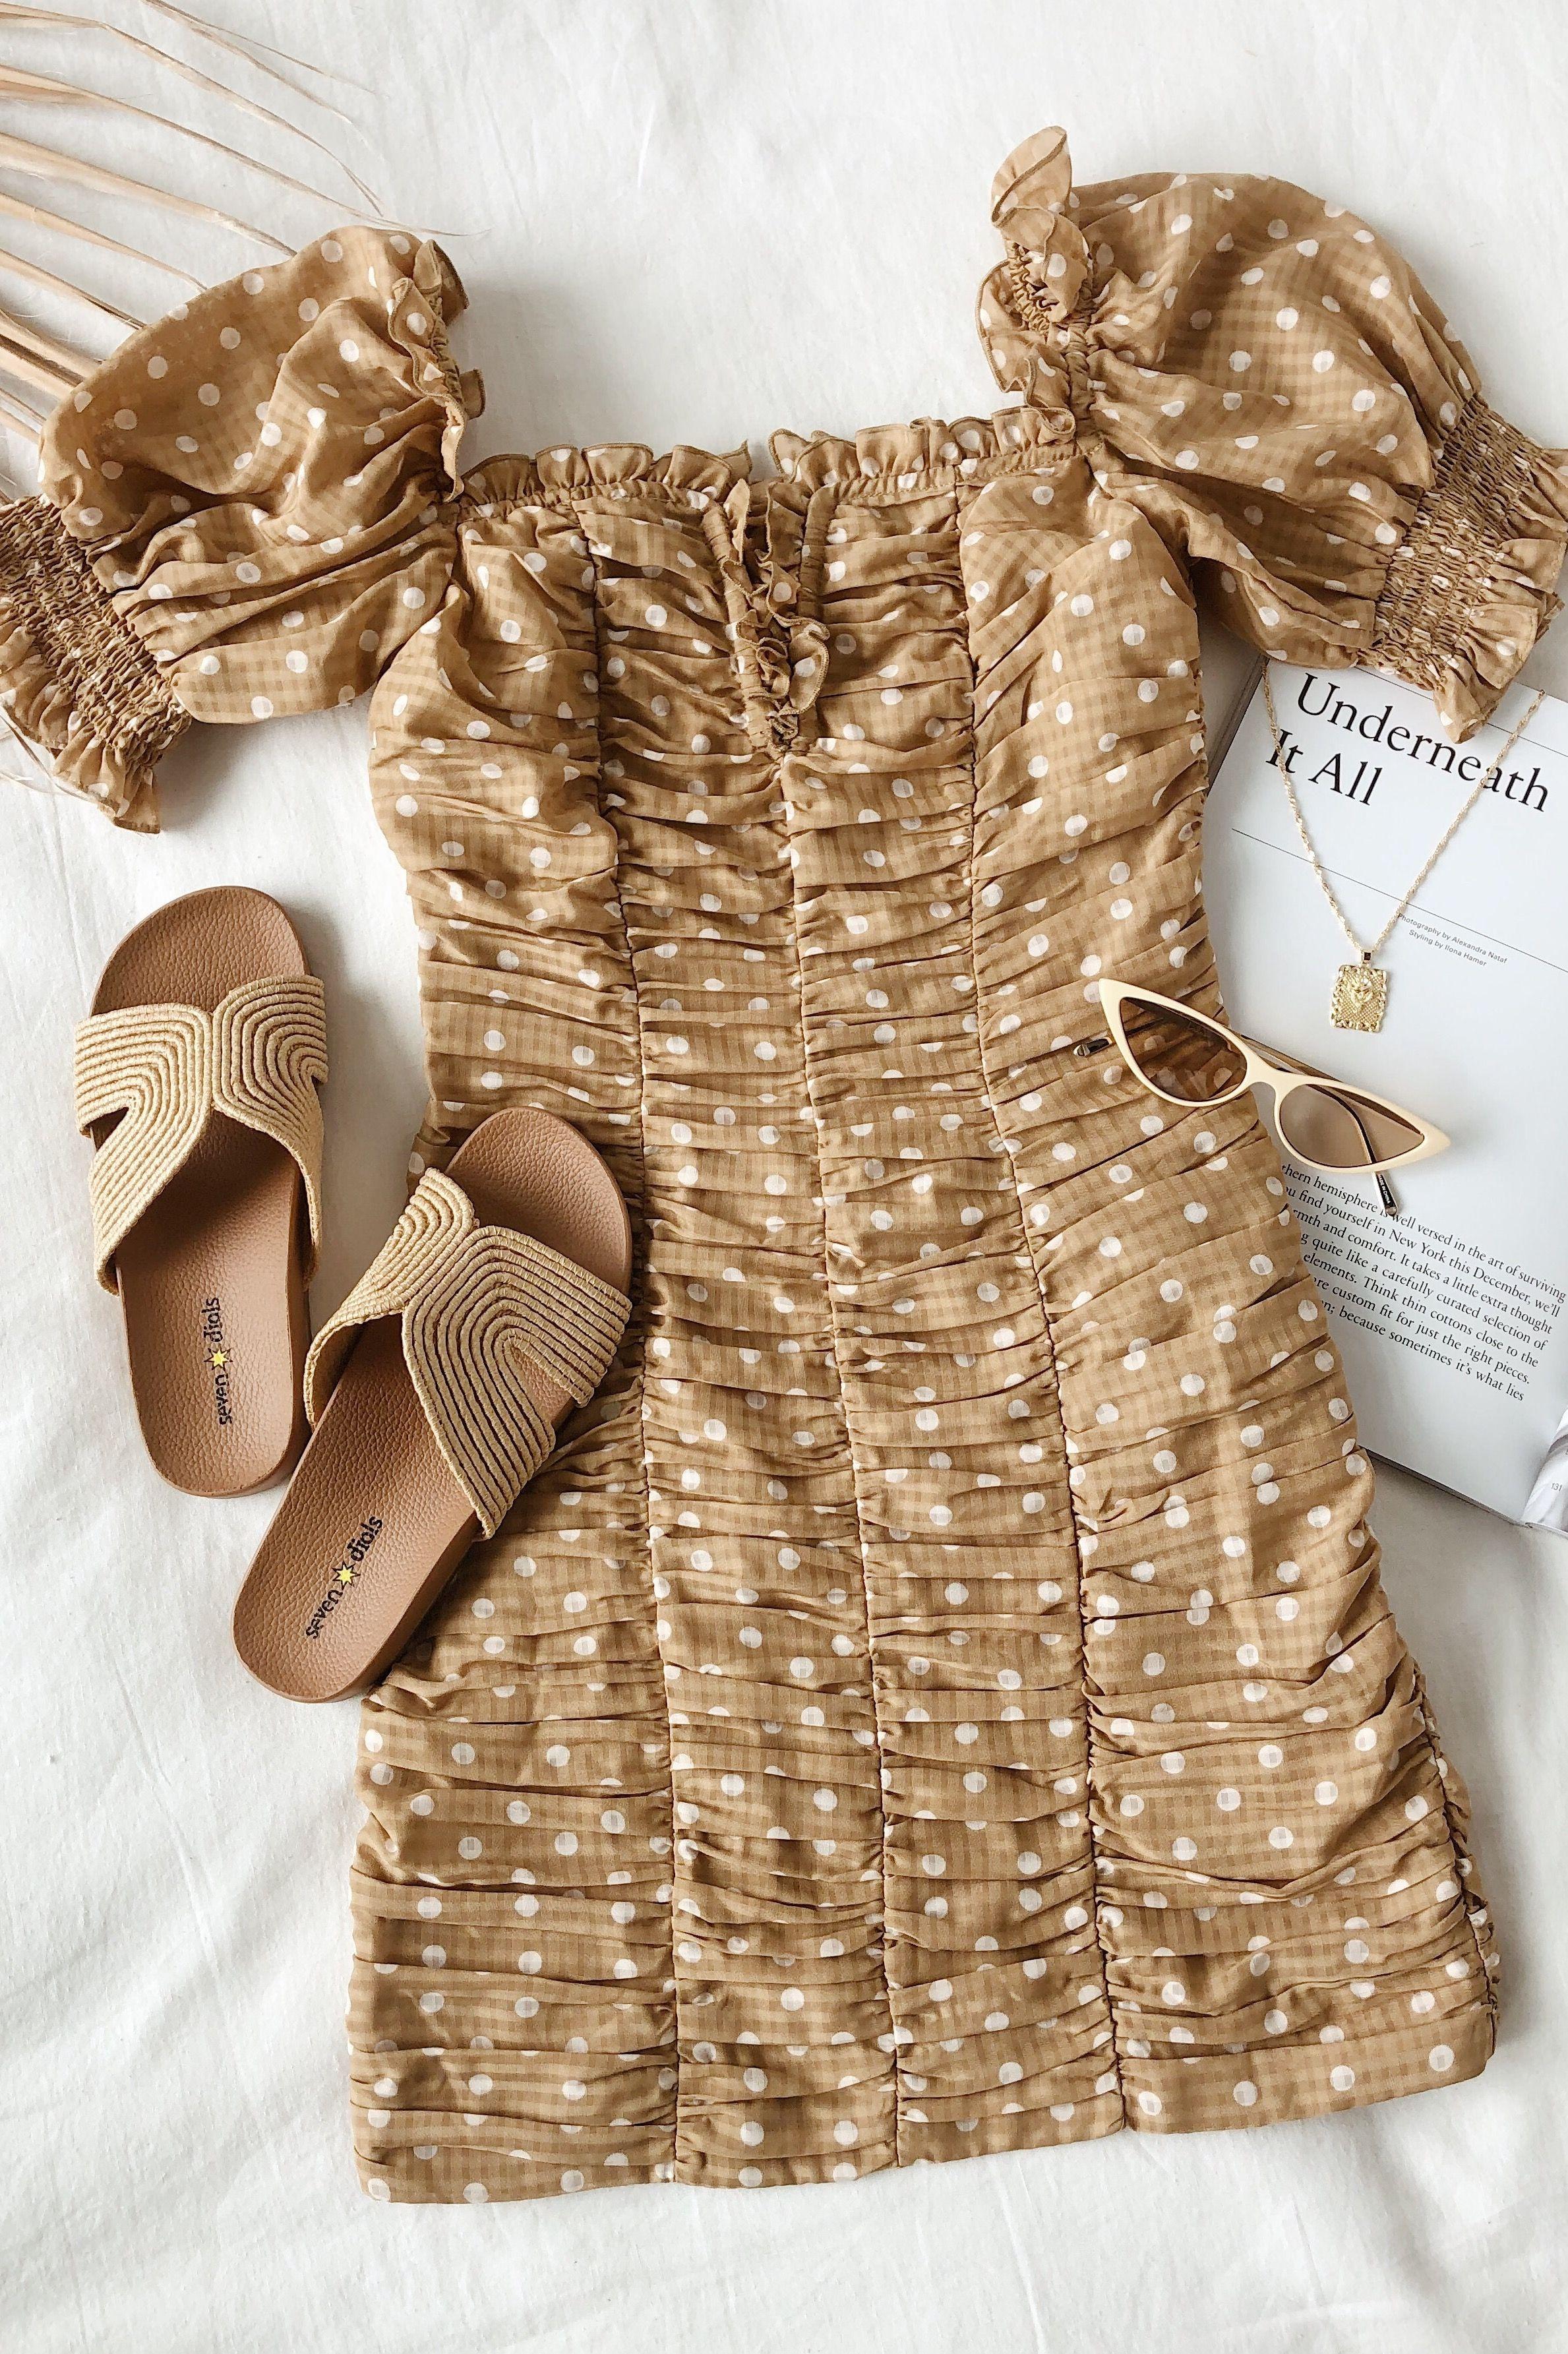 Rosie Tan Polka Dot Ruched Bodycon Dress Fitted Dress Outfit Ruched Bodycon Dress Flirty Outfits [ 3570 x 2378 Pixel ]